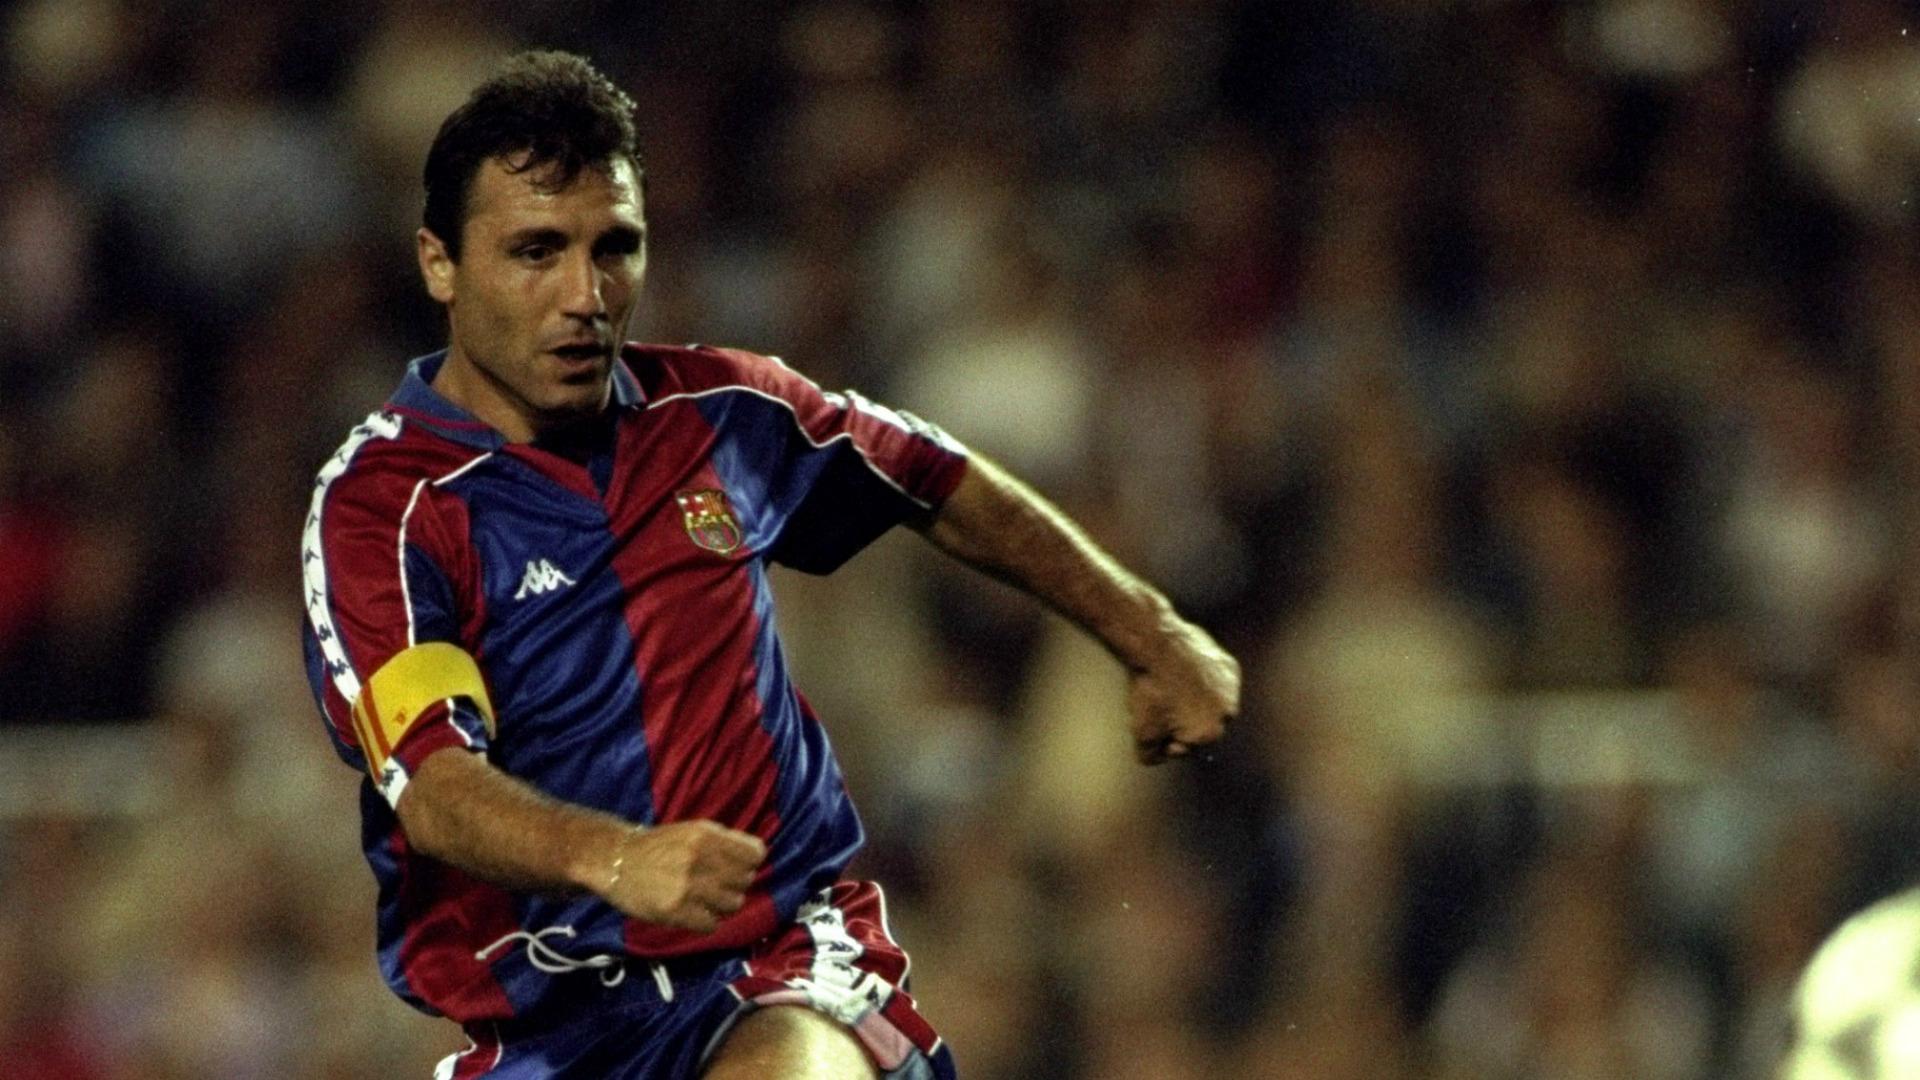 Hristo Stoichkov ex Barcelona player